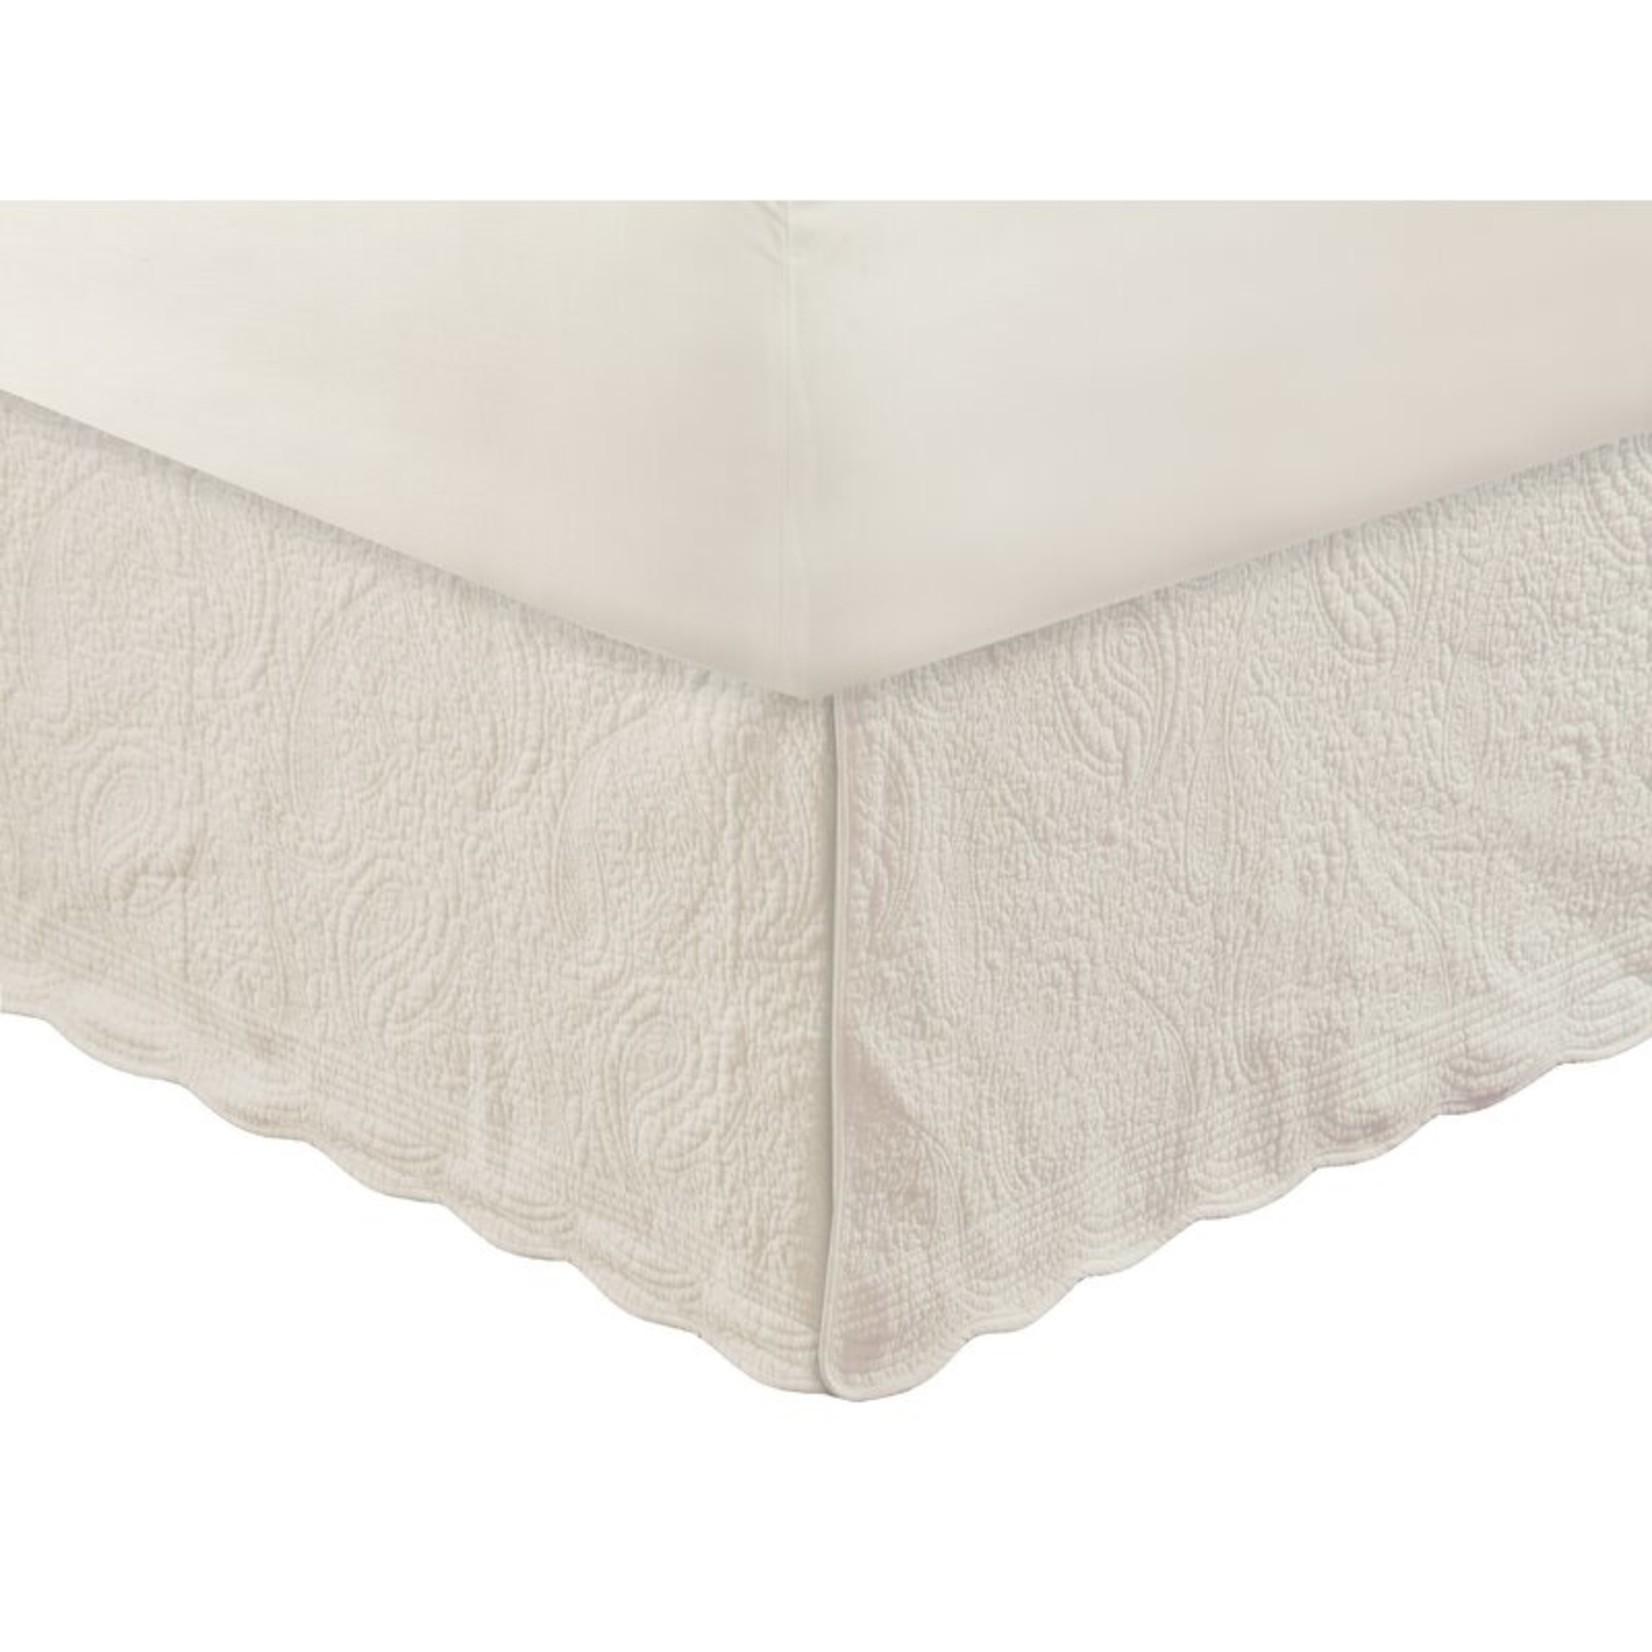 "*Jesper Quilted 18"" Bed Skirt - Queen - FINAL SALE"